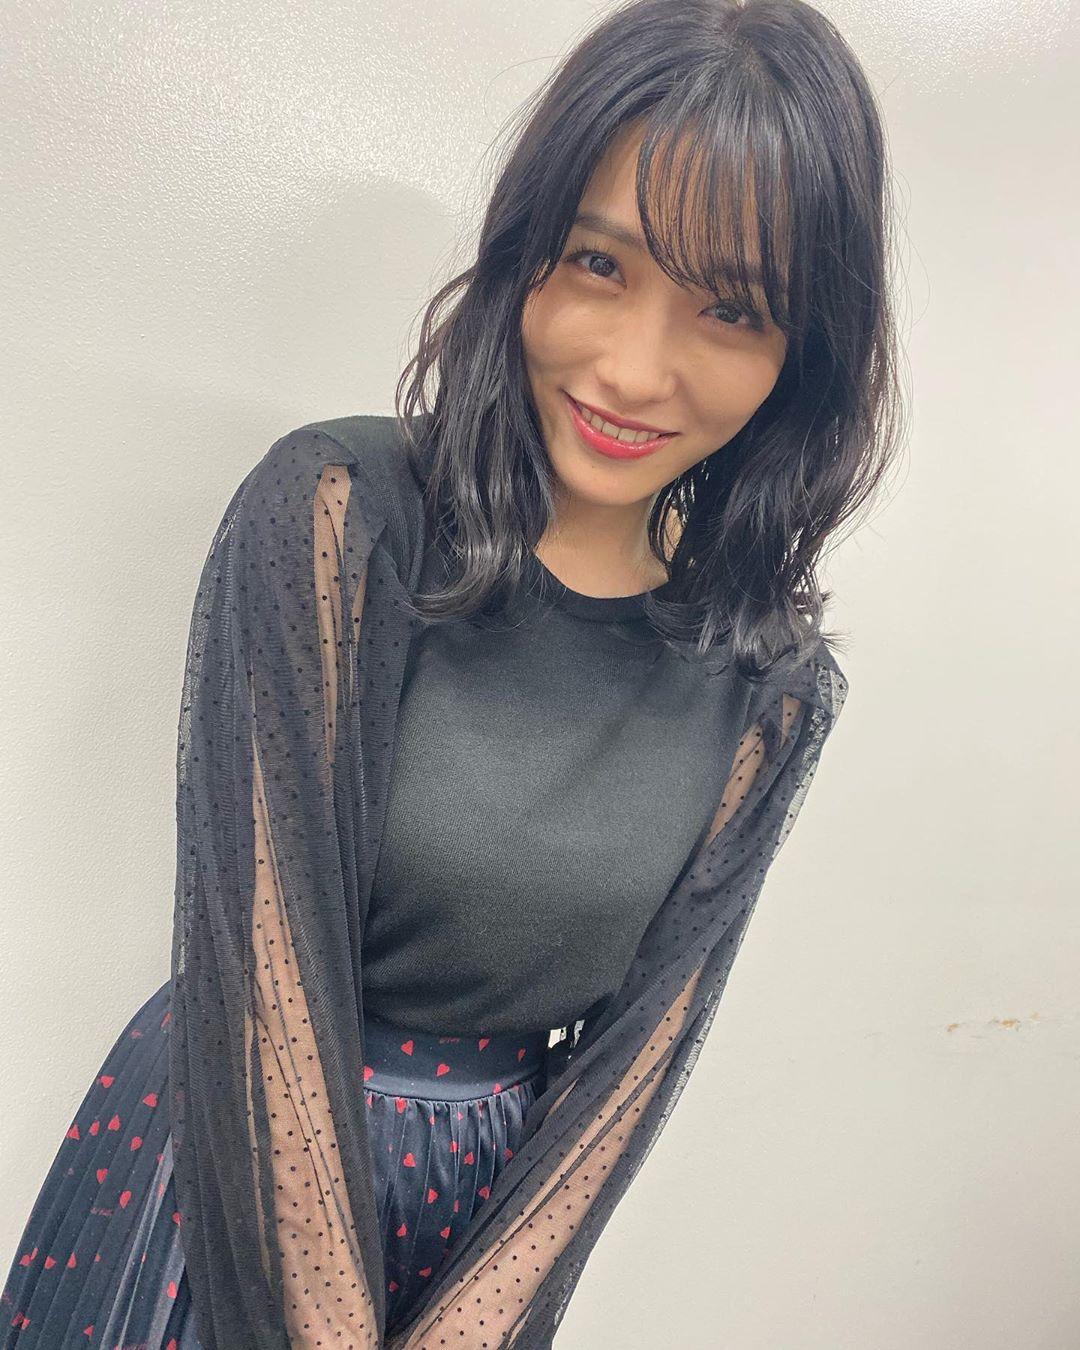 konno_anna223.jpg